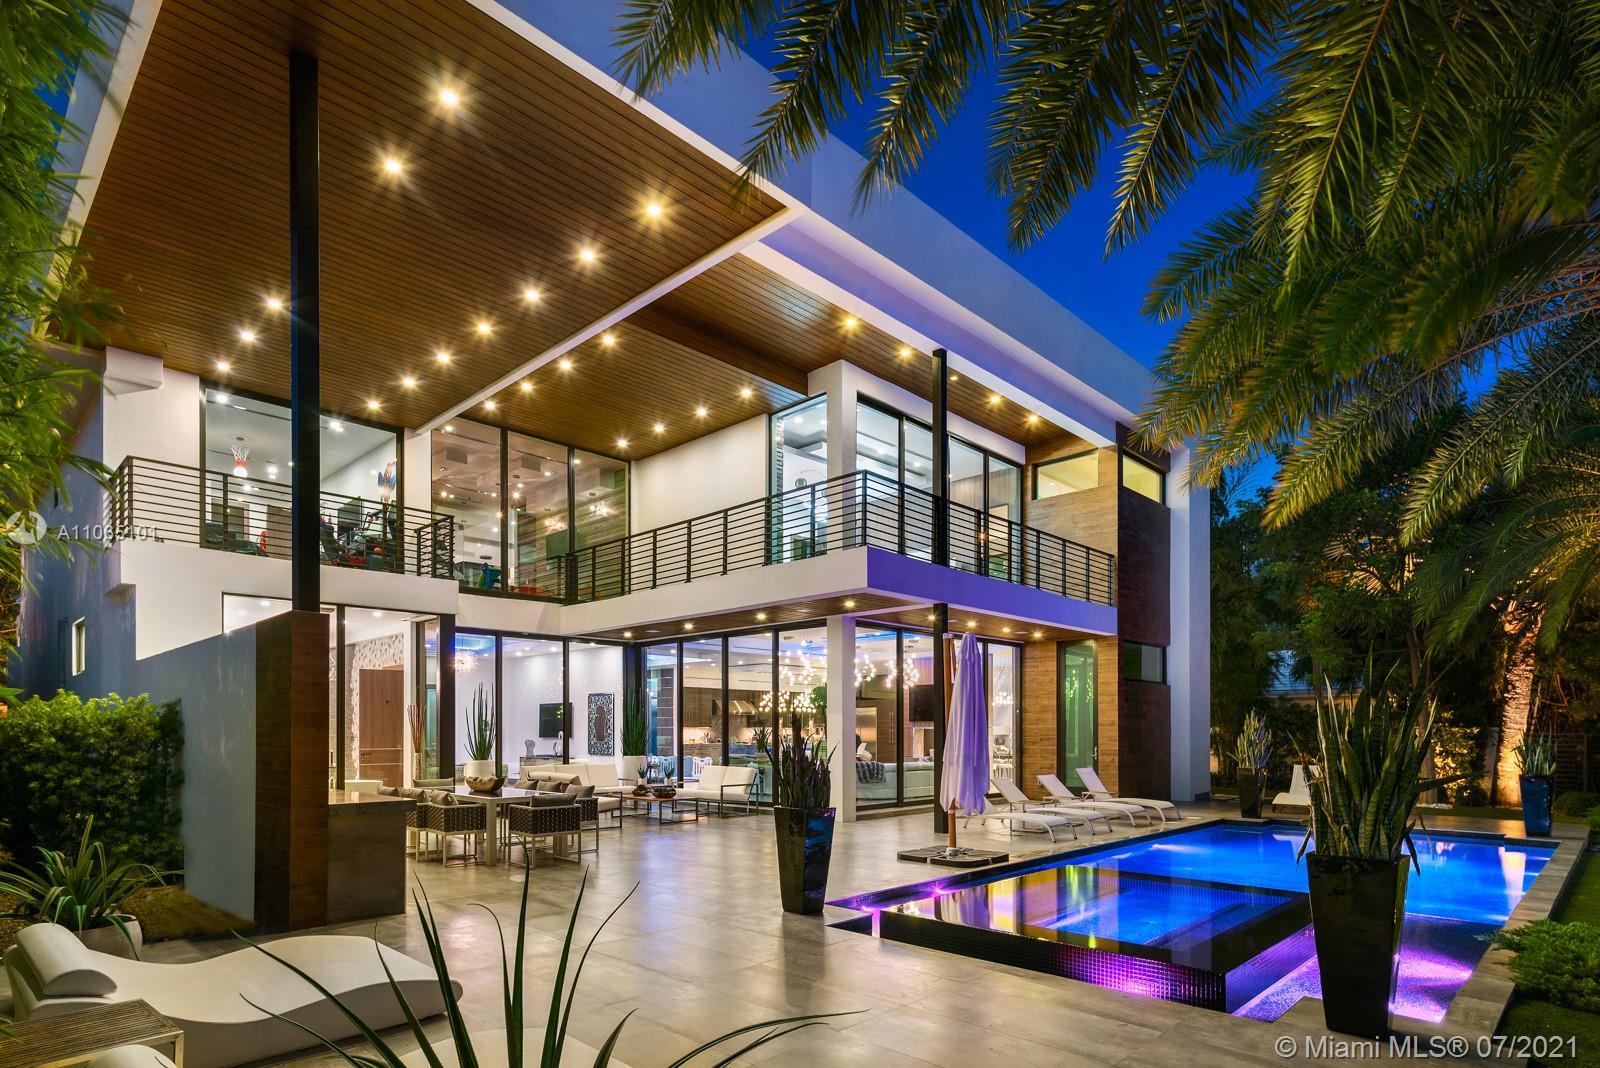 Property for sale at 2542 Aqua Vista Blvd, Fort Lauderdale,  Florida 33301